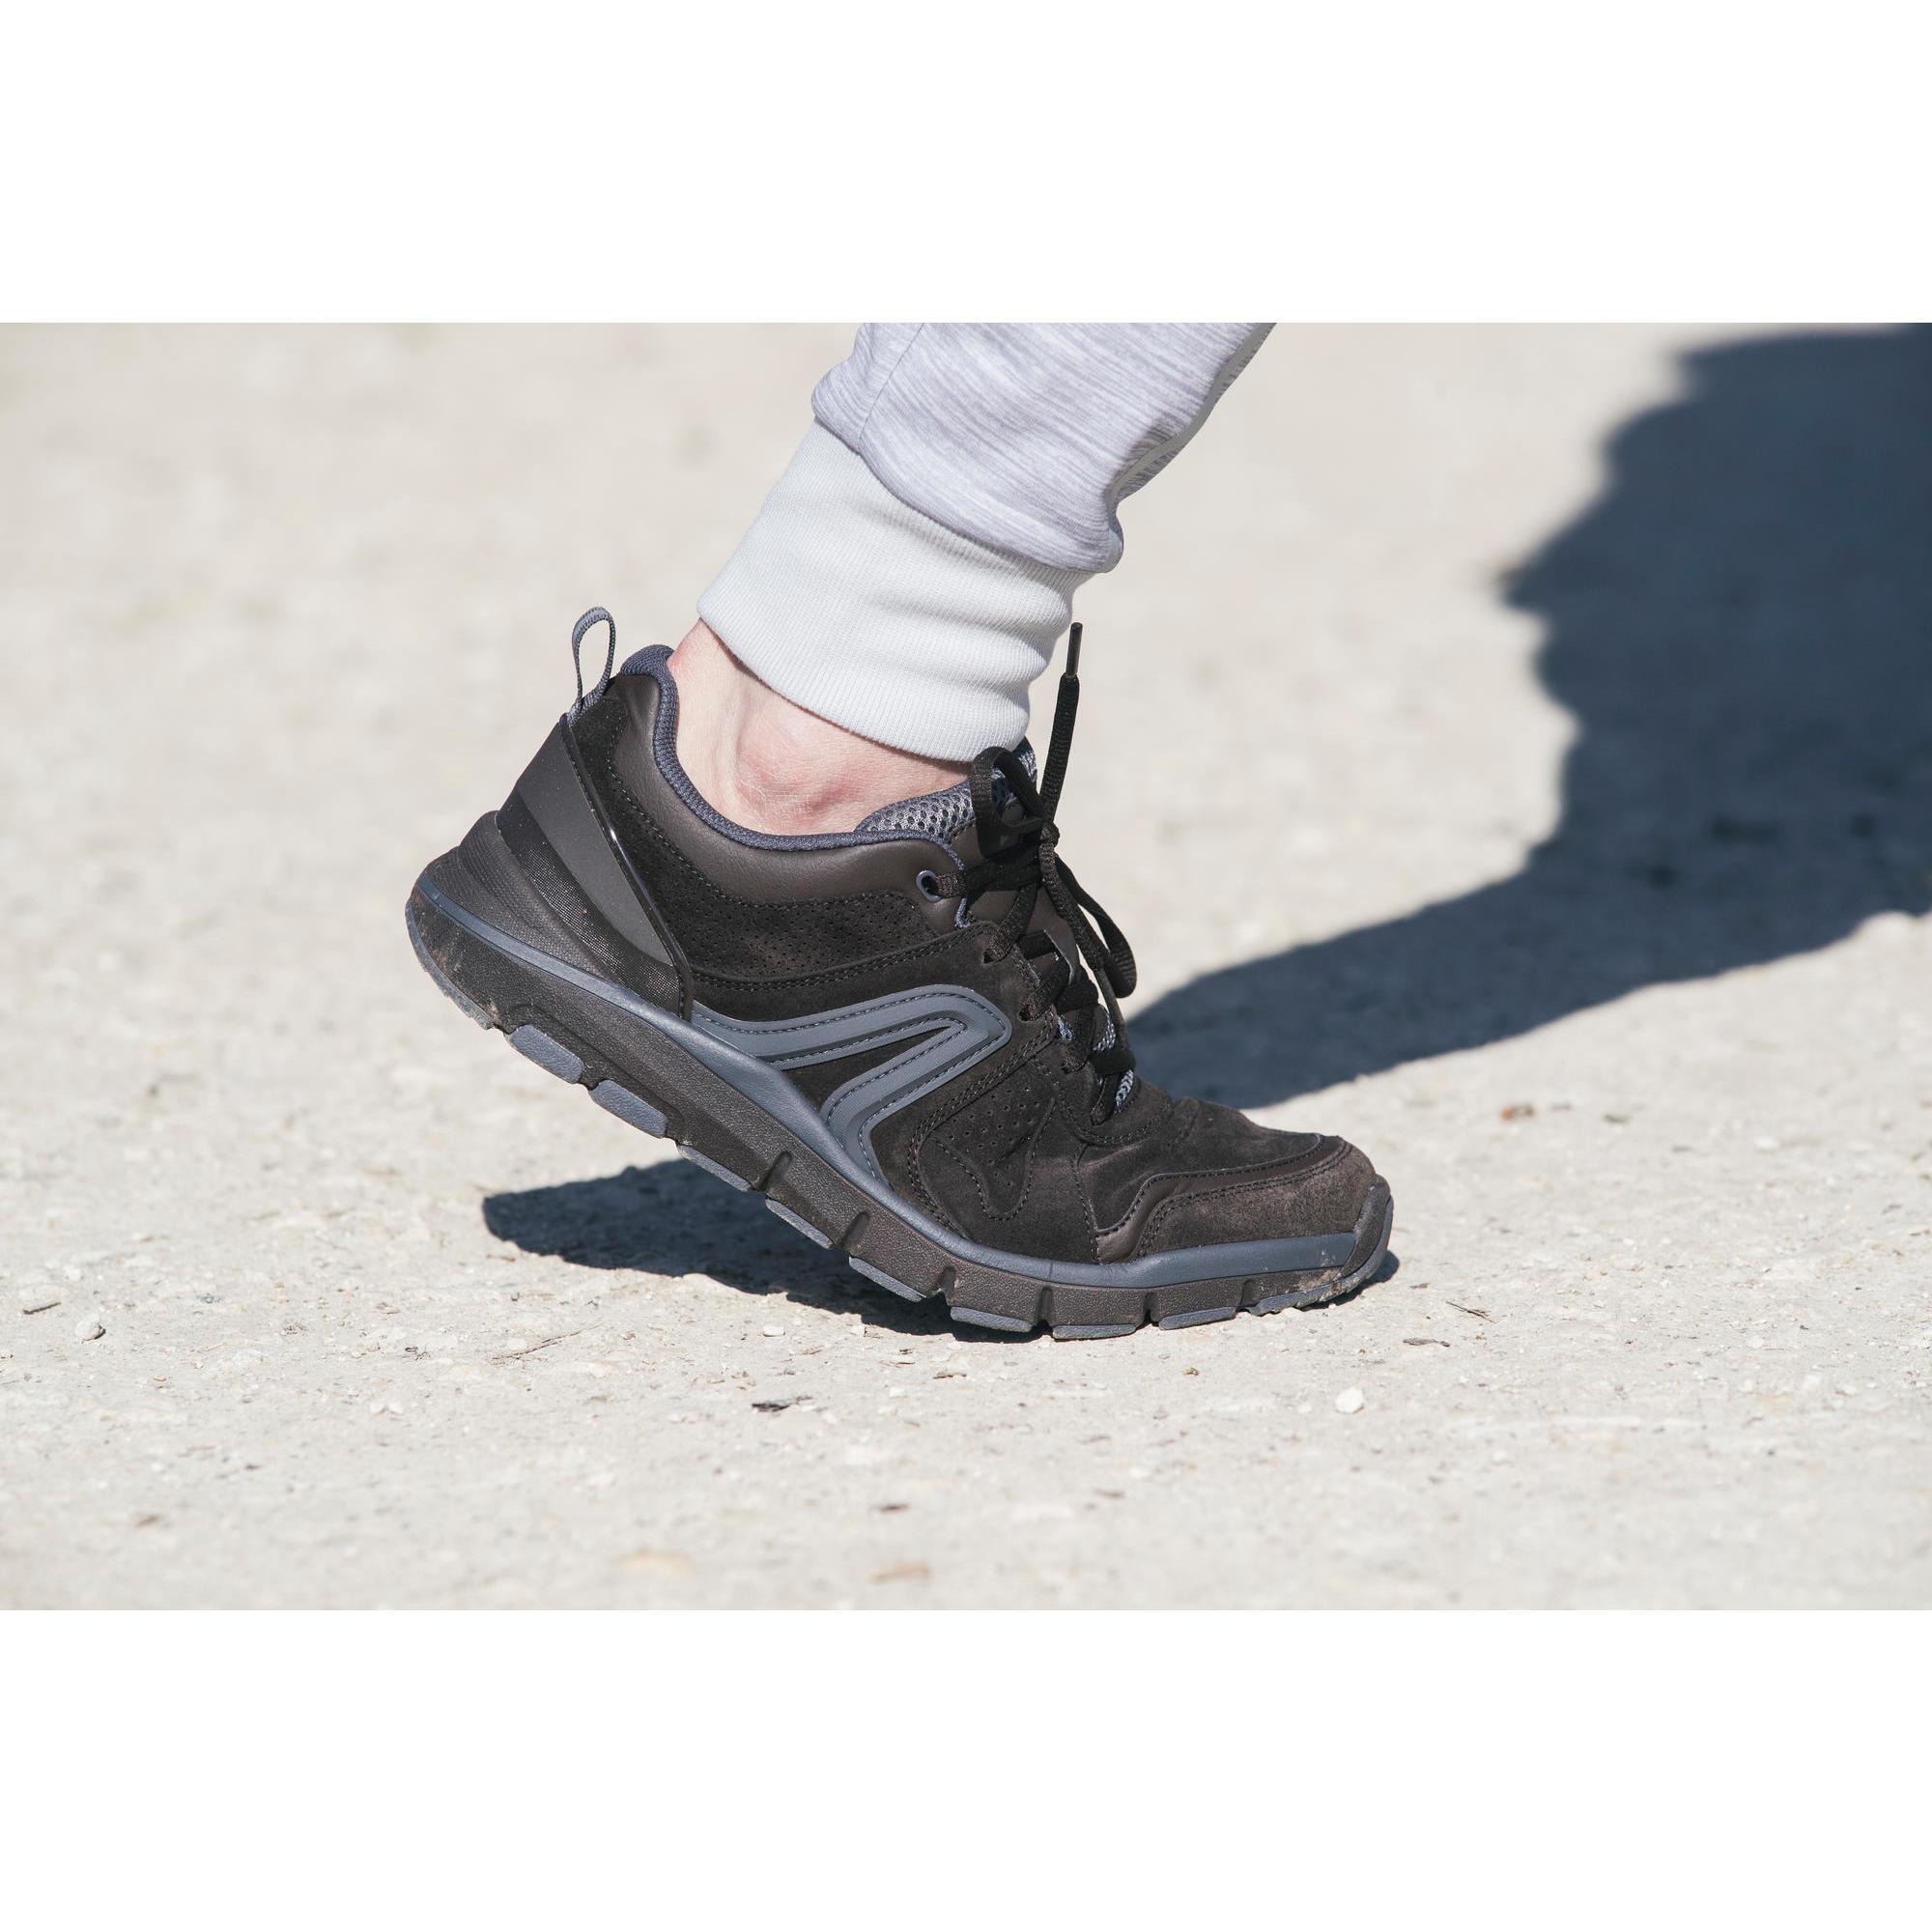 732cd828bd4ed Homme Sportive Cuir 540 Newfeel Hw Marche Decathlon Chaussures 4qw1Rf